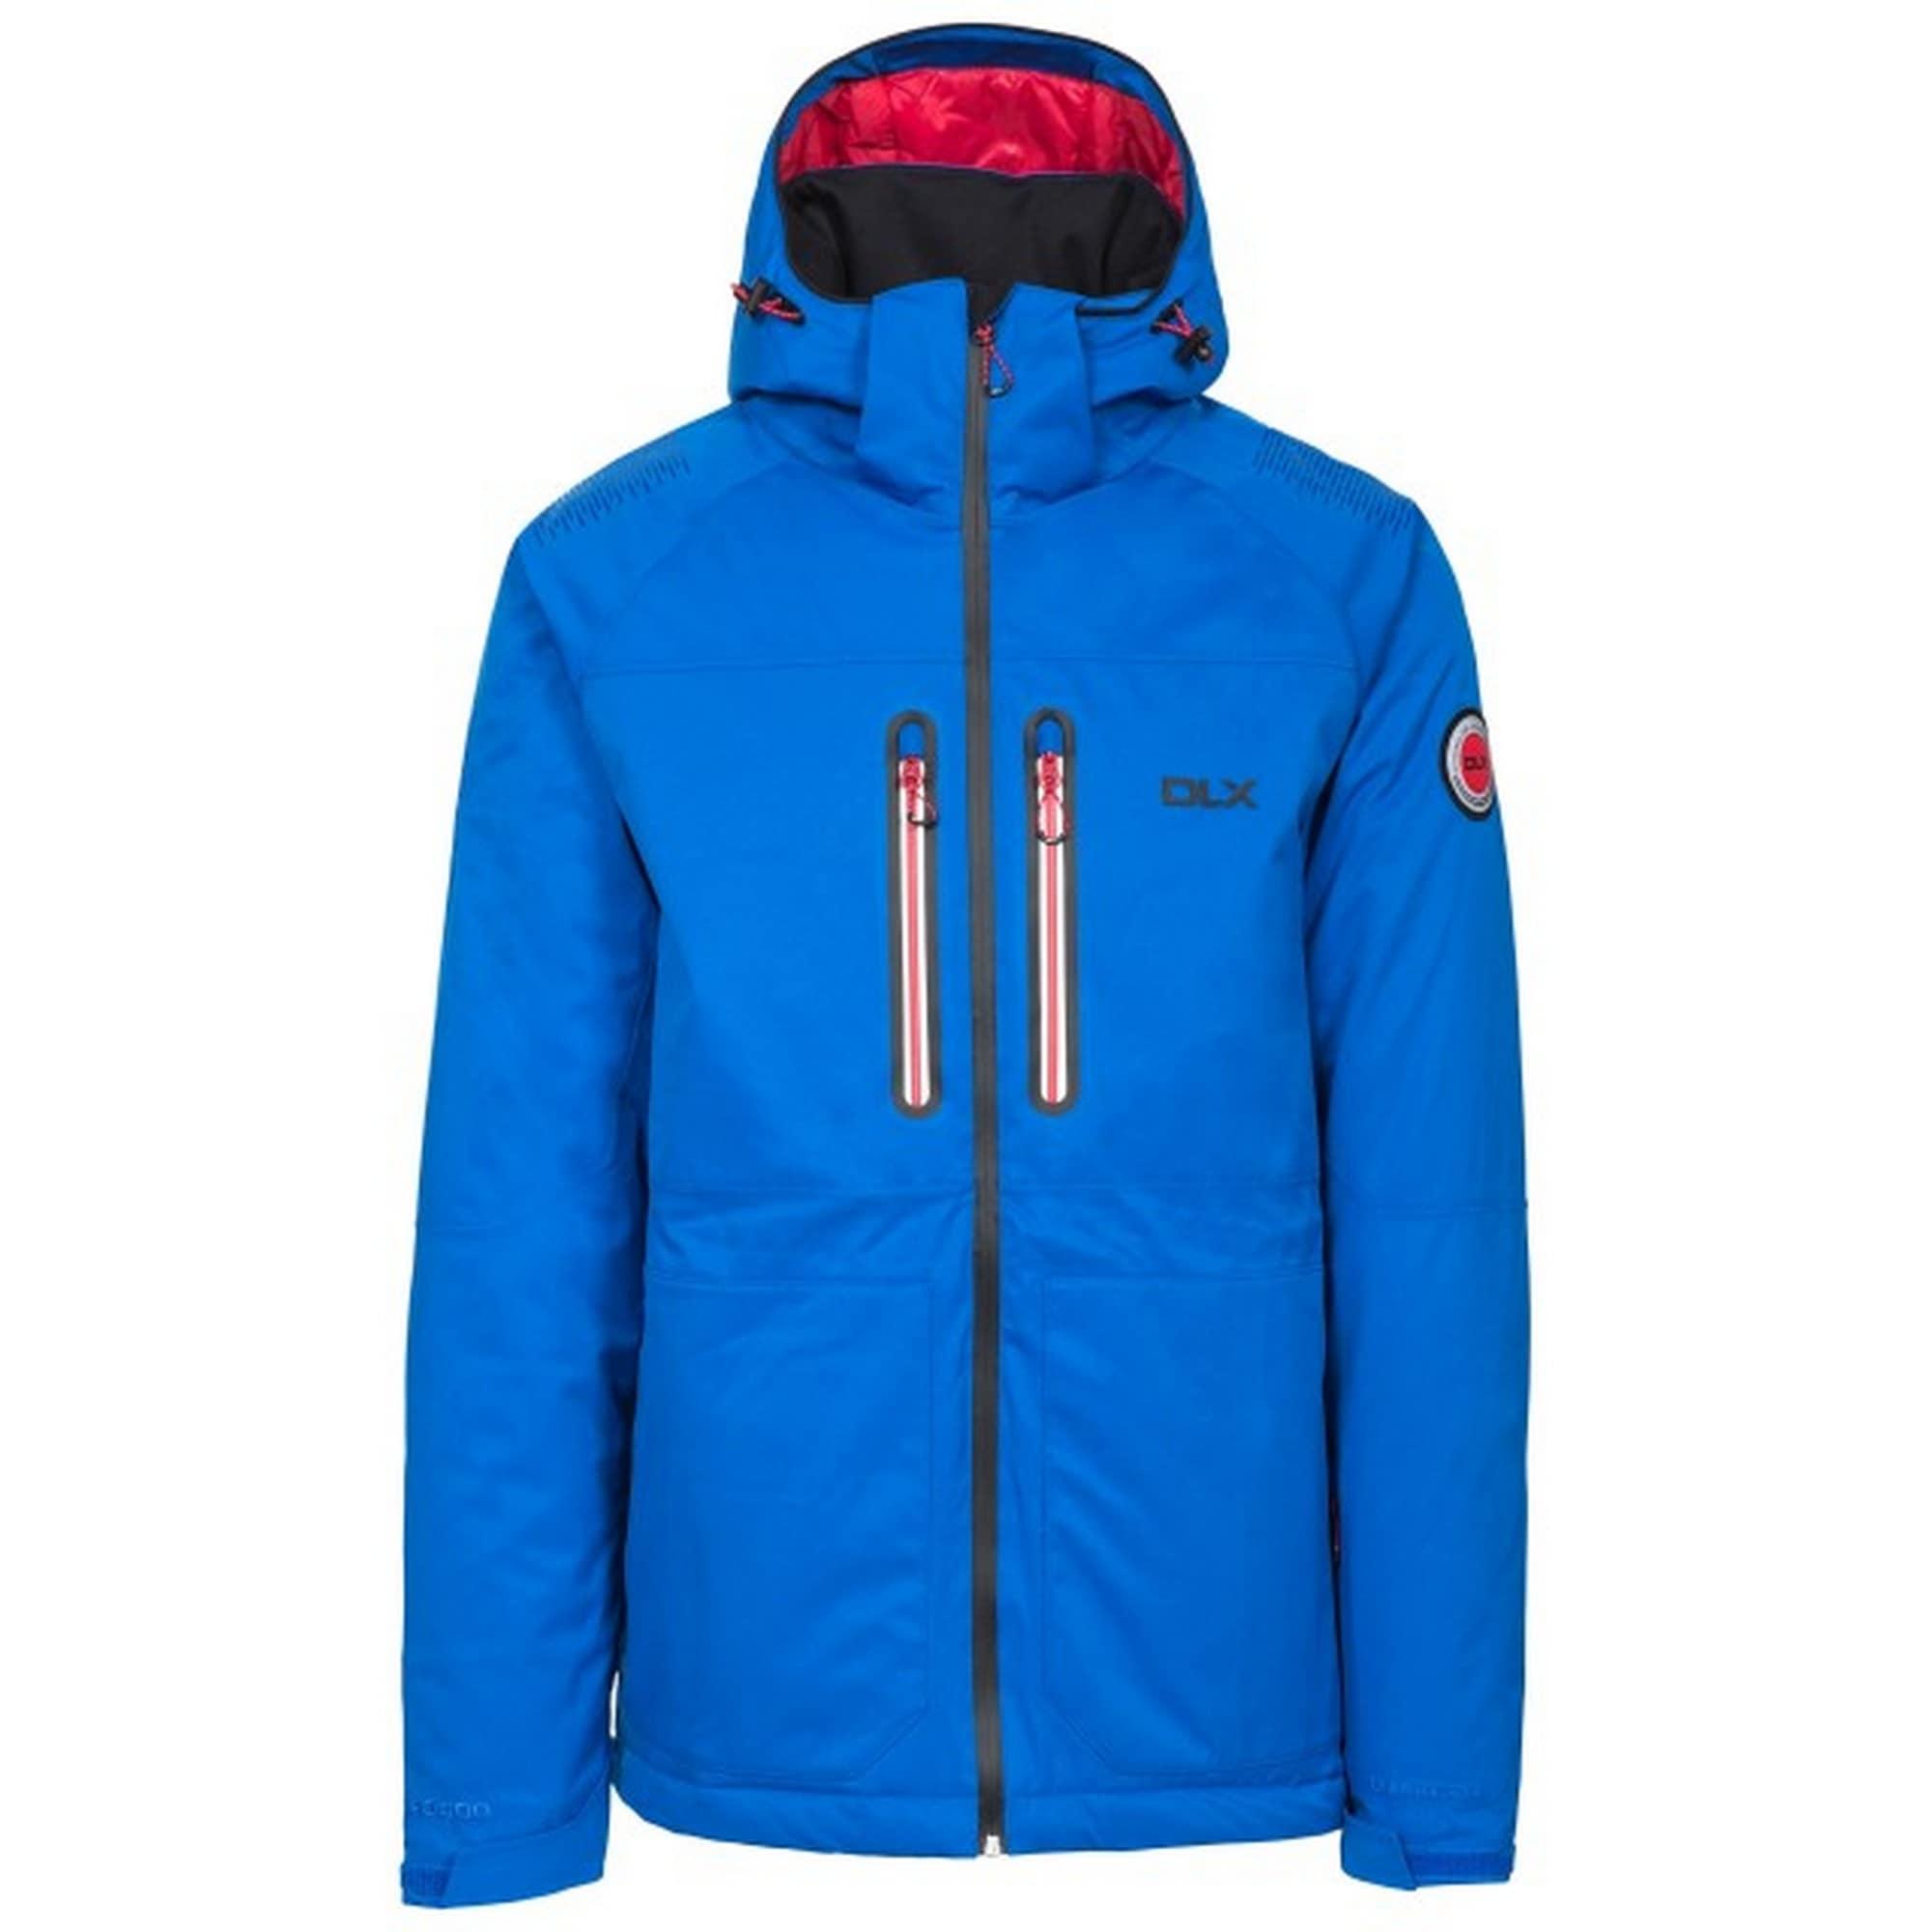 Trespass Skijacke | Sportbekleidung | Blau | Pu - Polyamid | Trespass